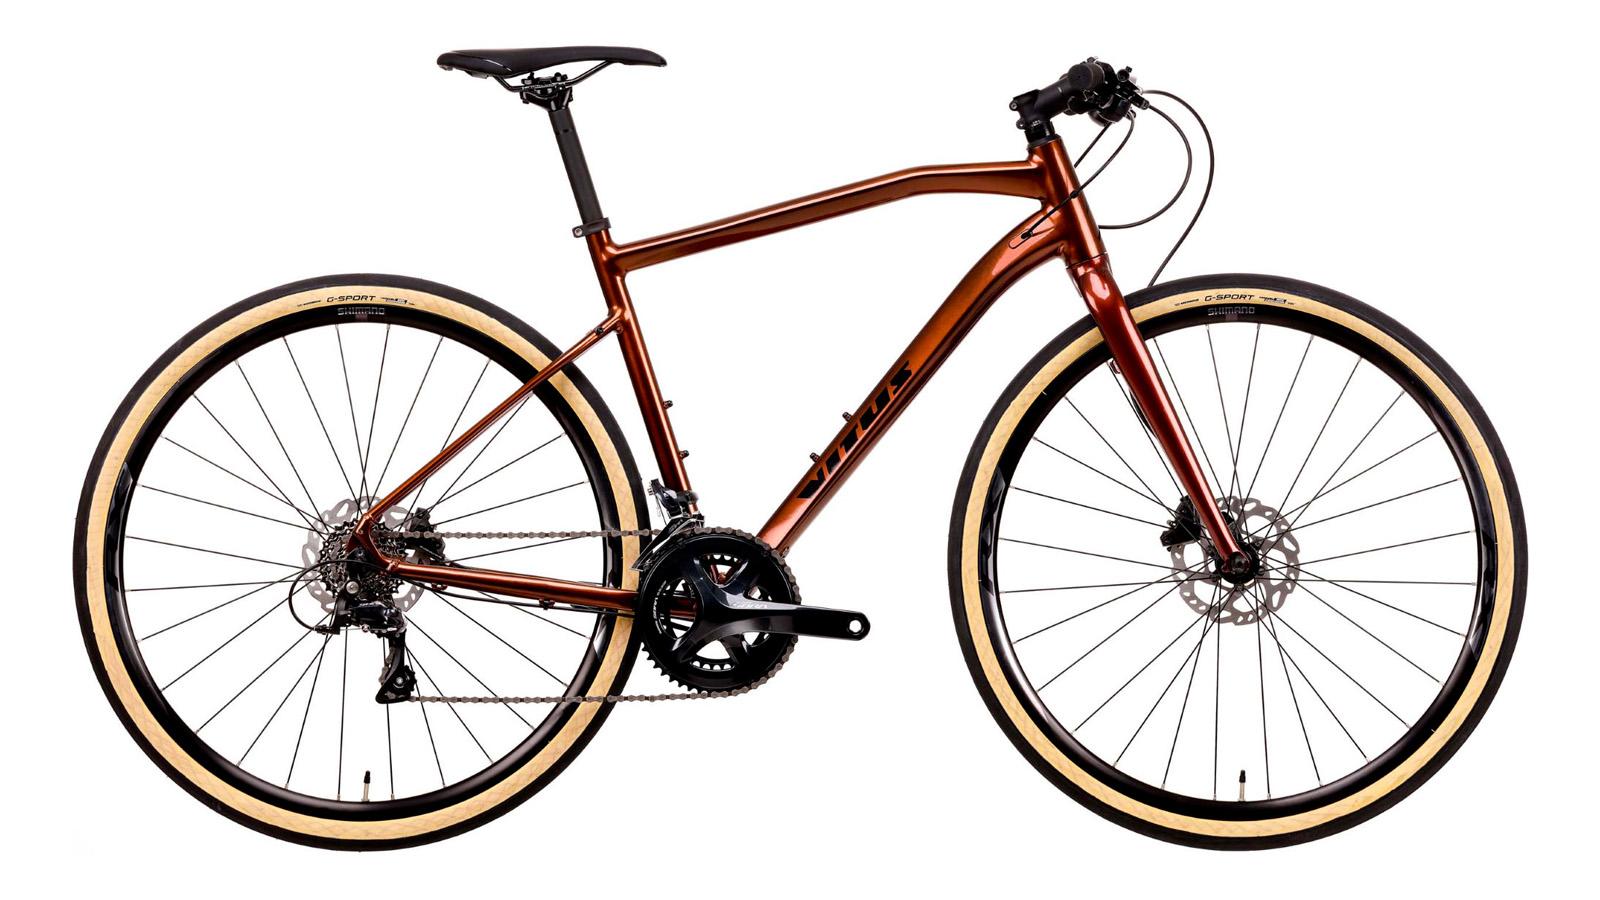 Best commuter bike: Vitus Mach 3 VRS